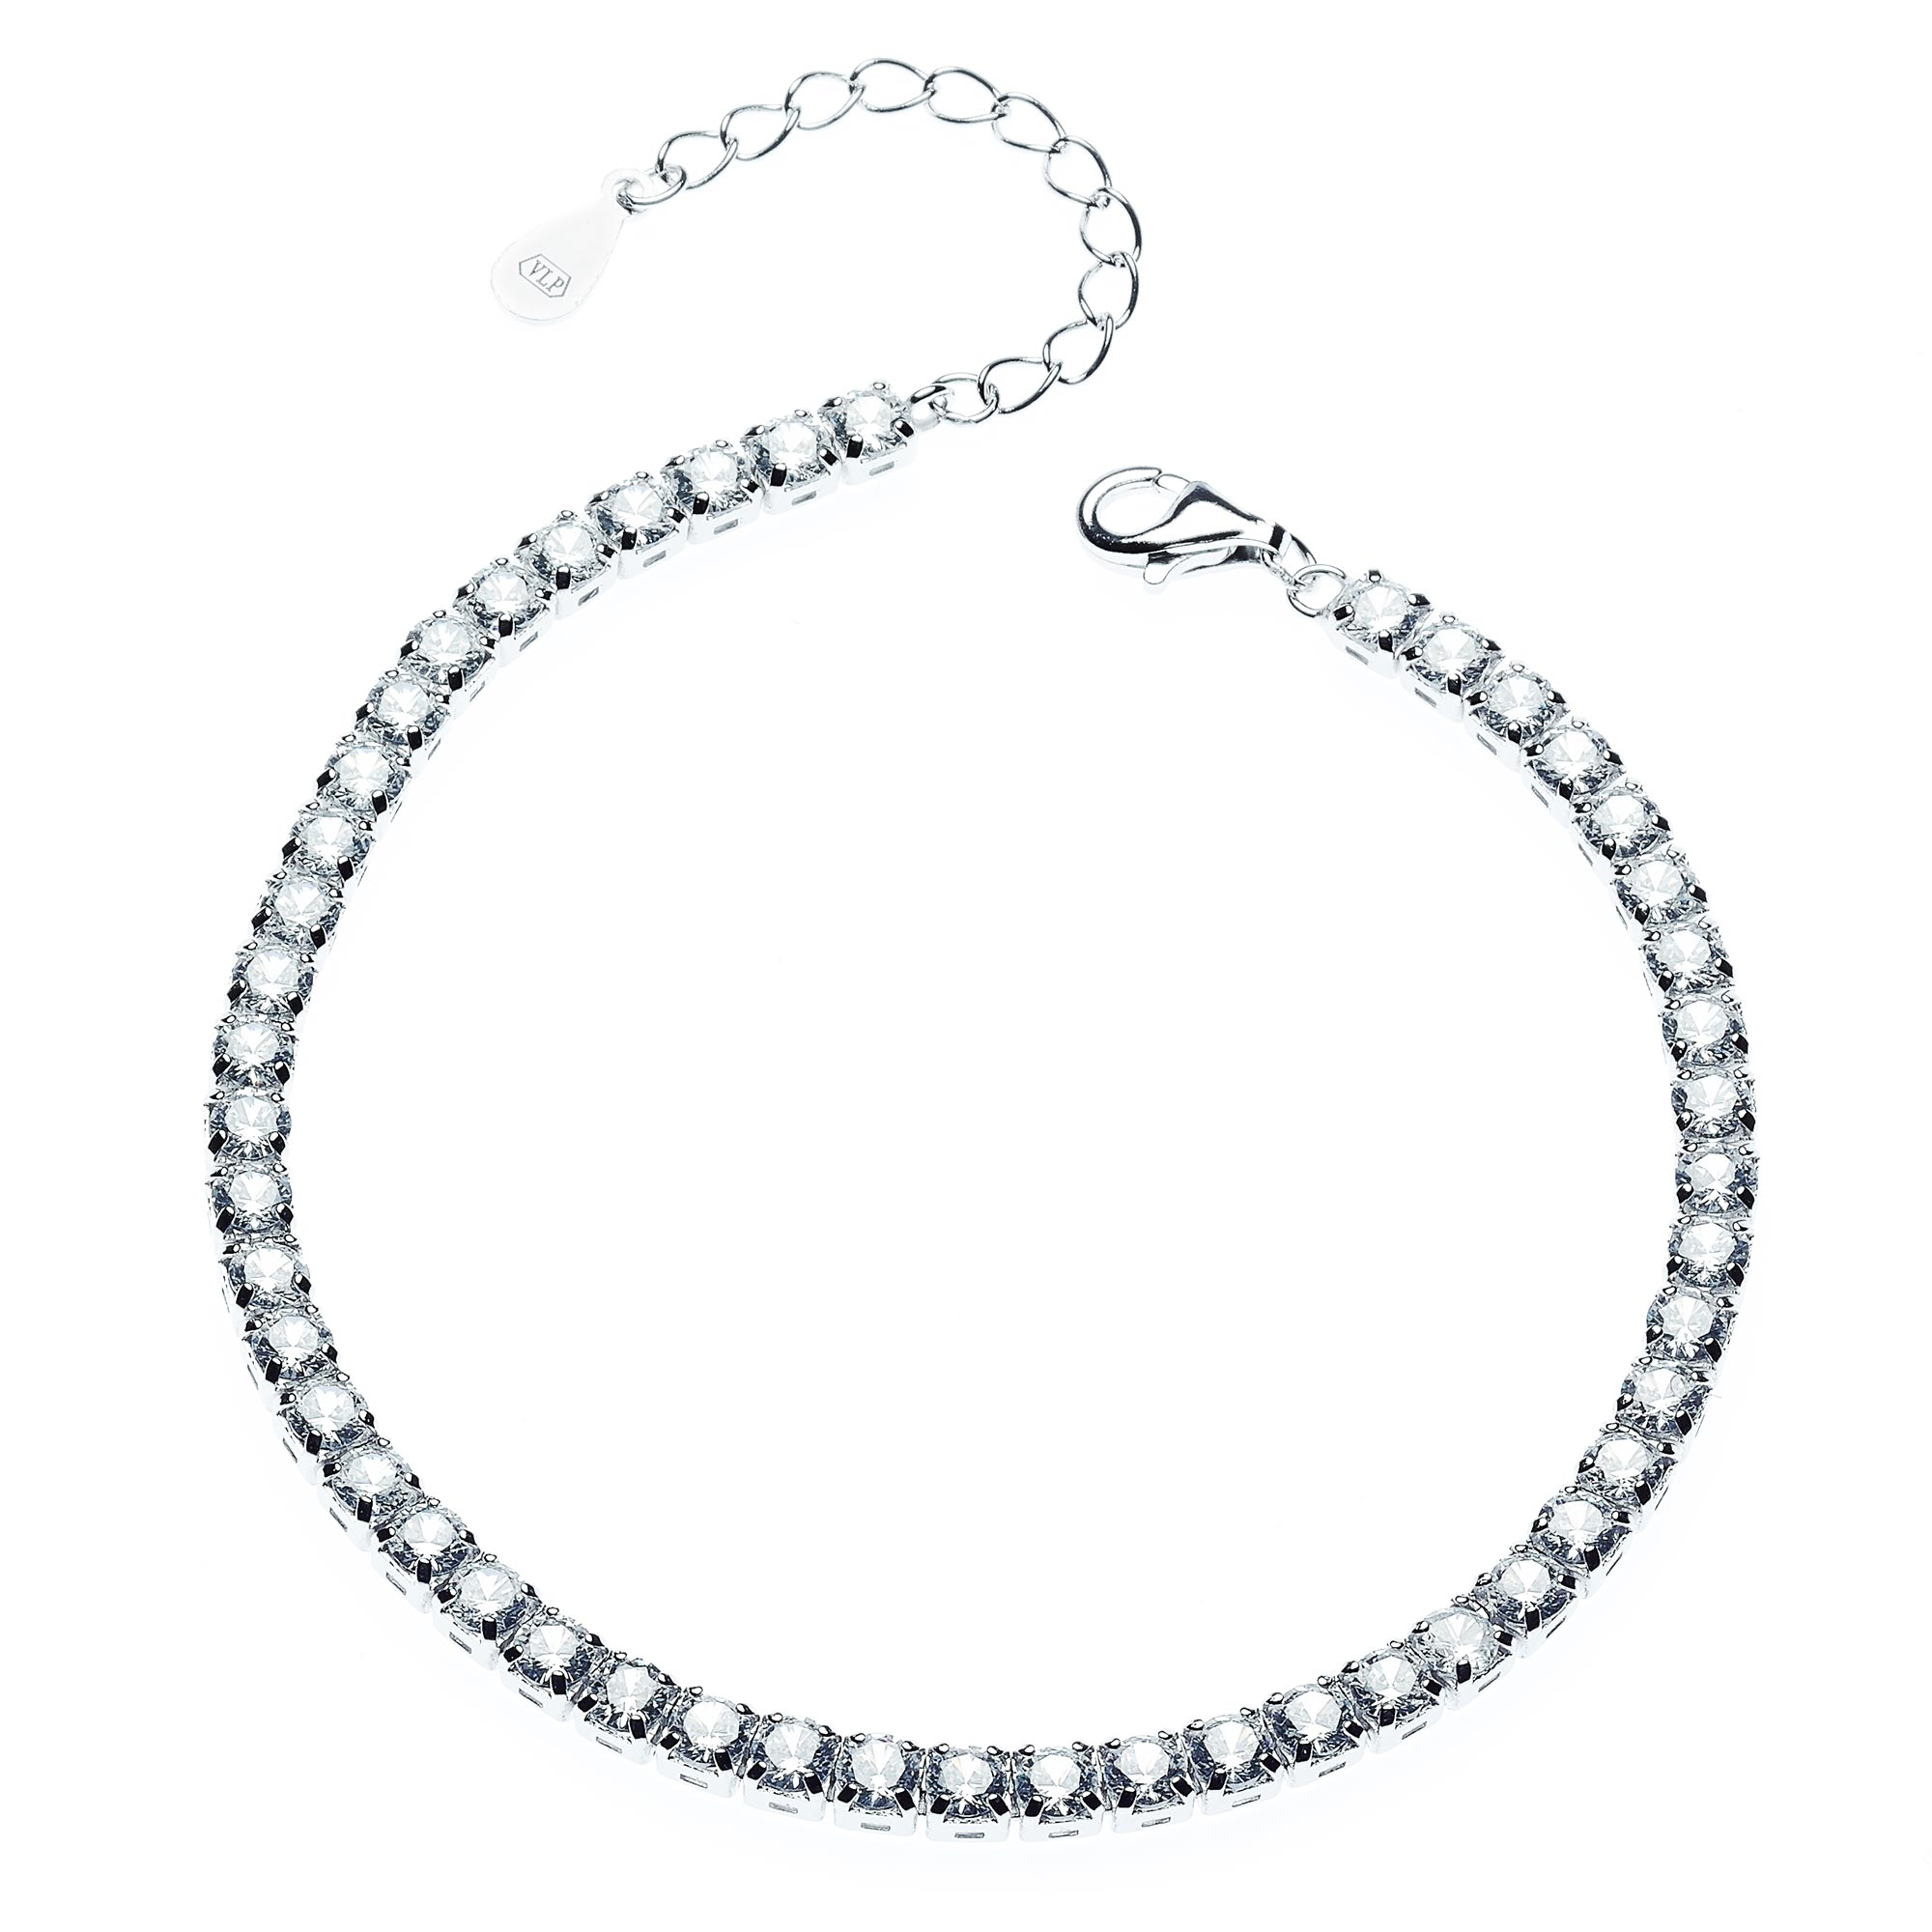 Dámský stříbrný náramek NB-1027